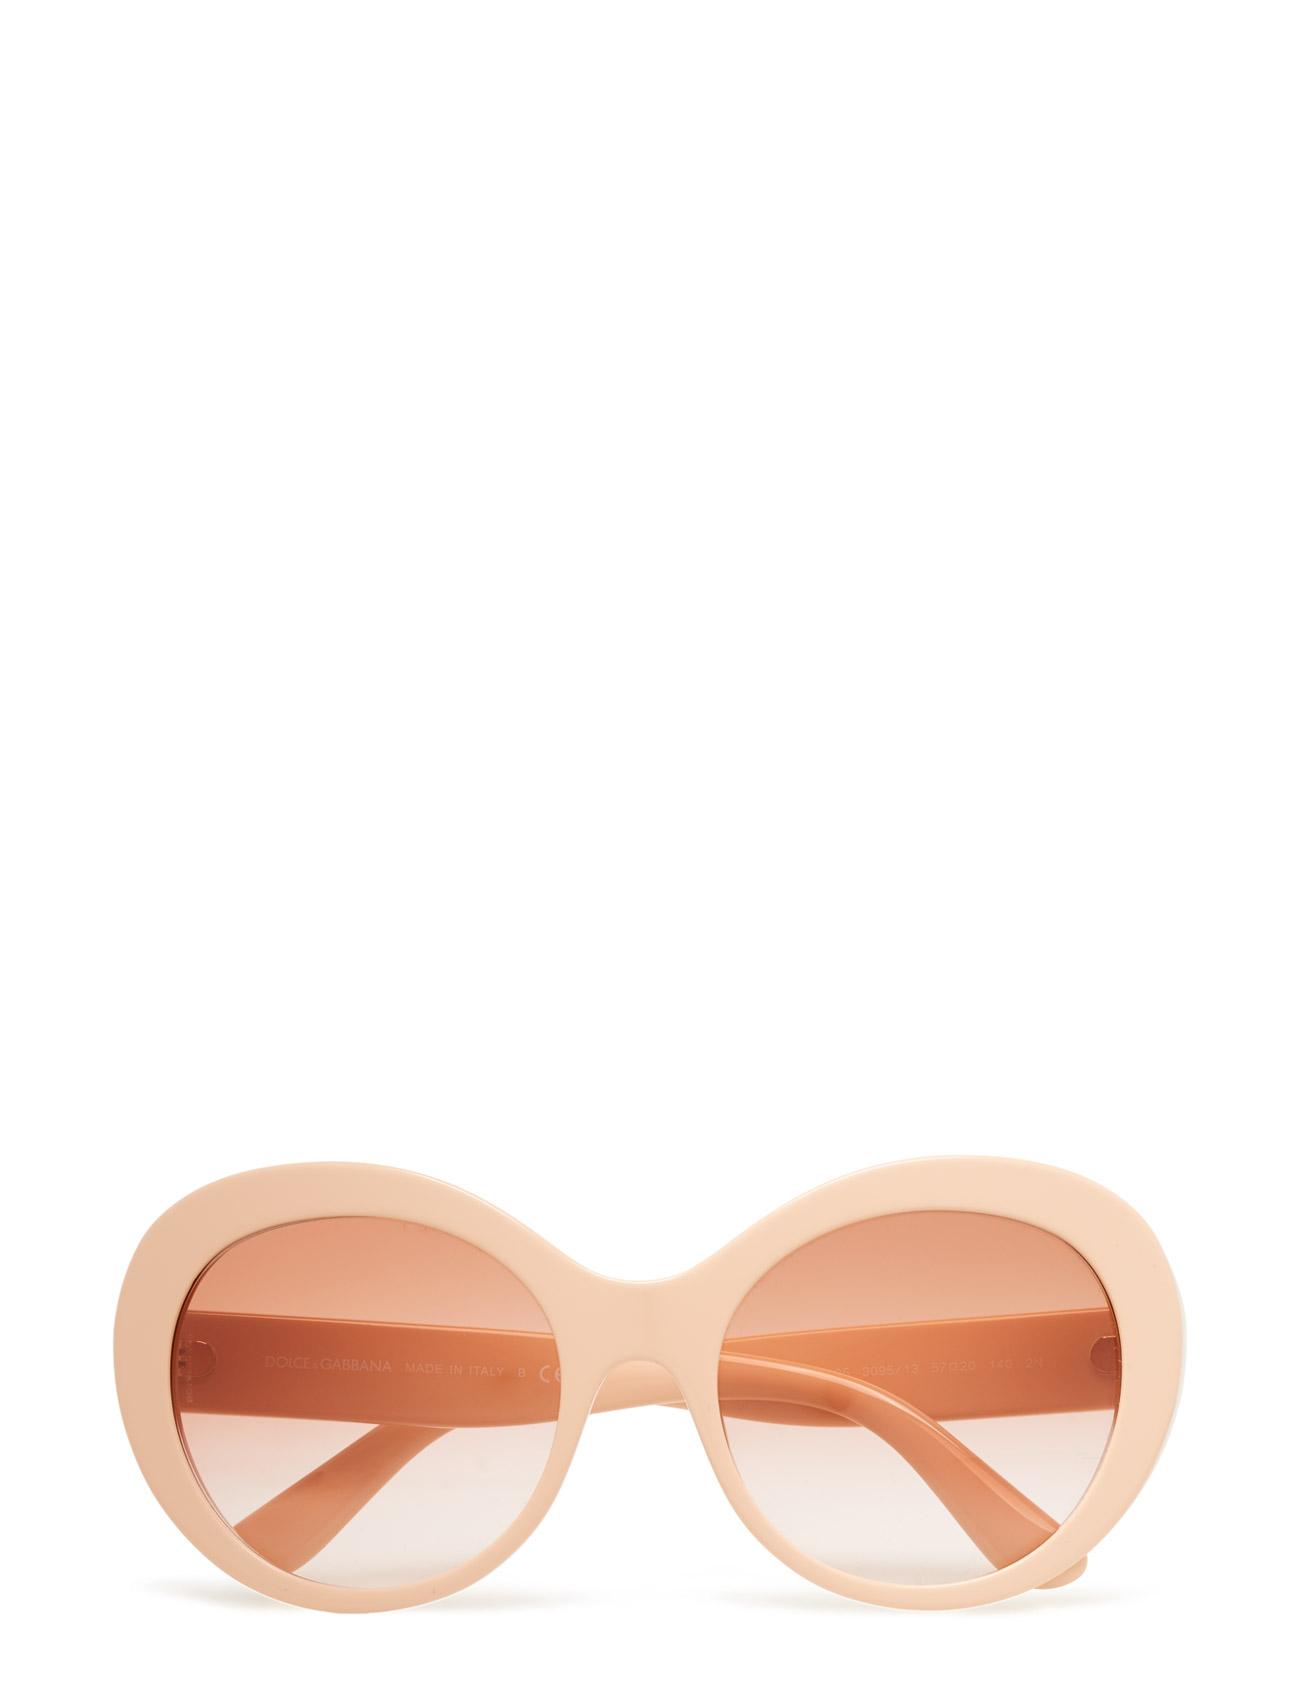 Cat Eye Dolce & Gabbana Sunglasses Solbriller til Kvinder i